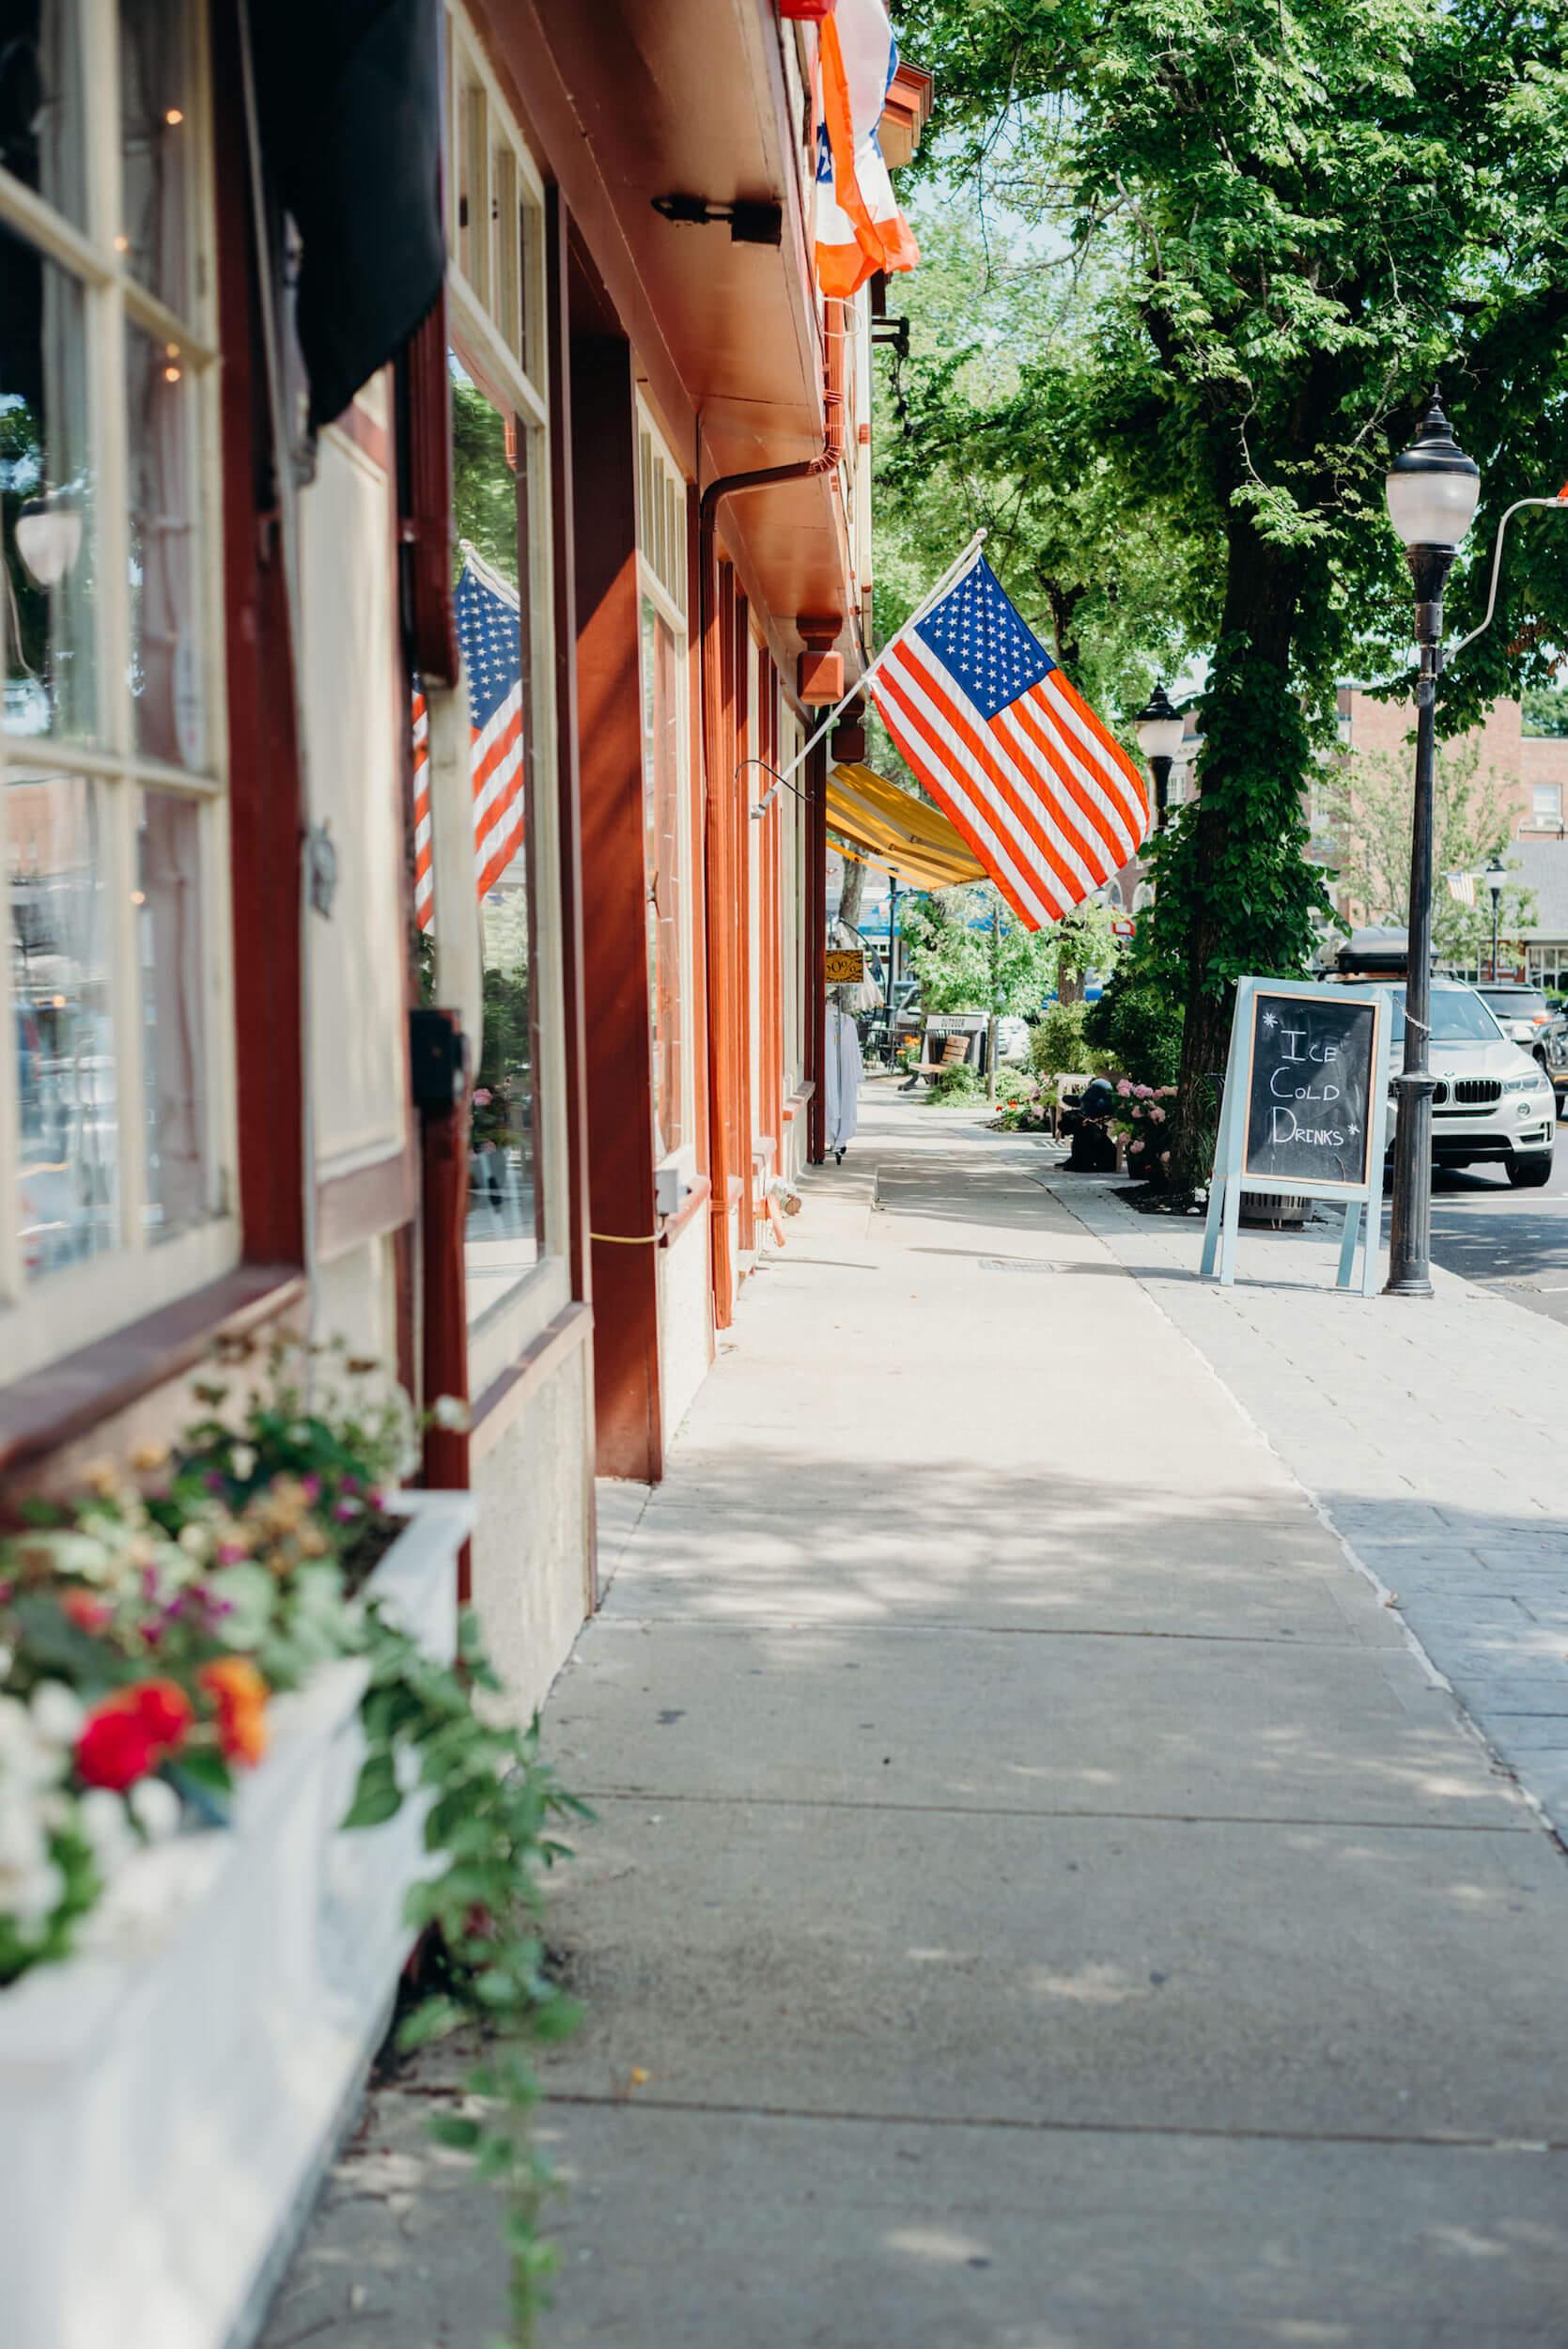 Exterior of Main Street in Cape Cod, Massachusetts, USA.